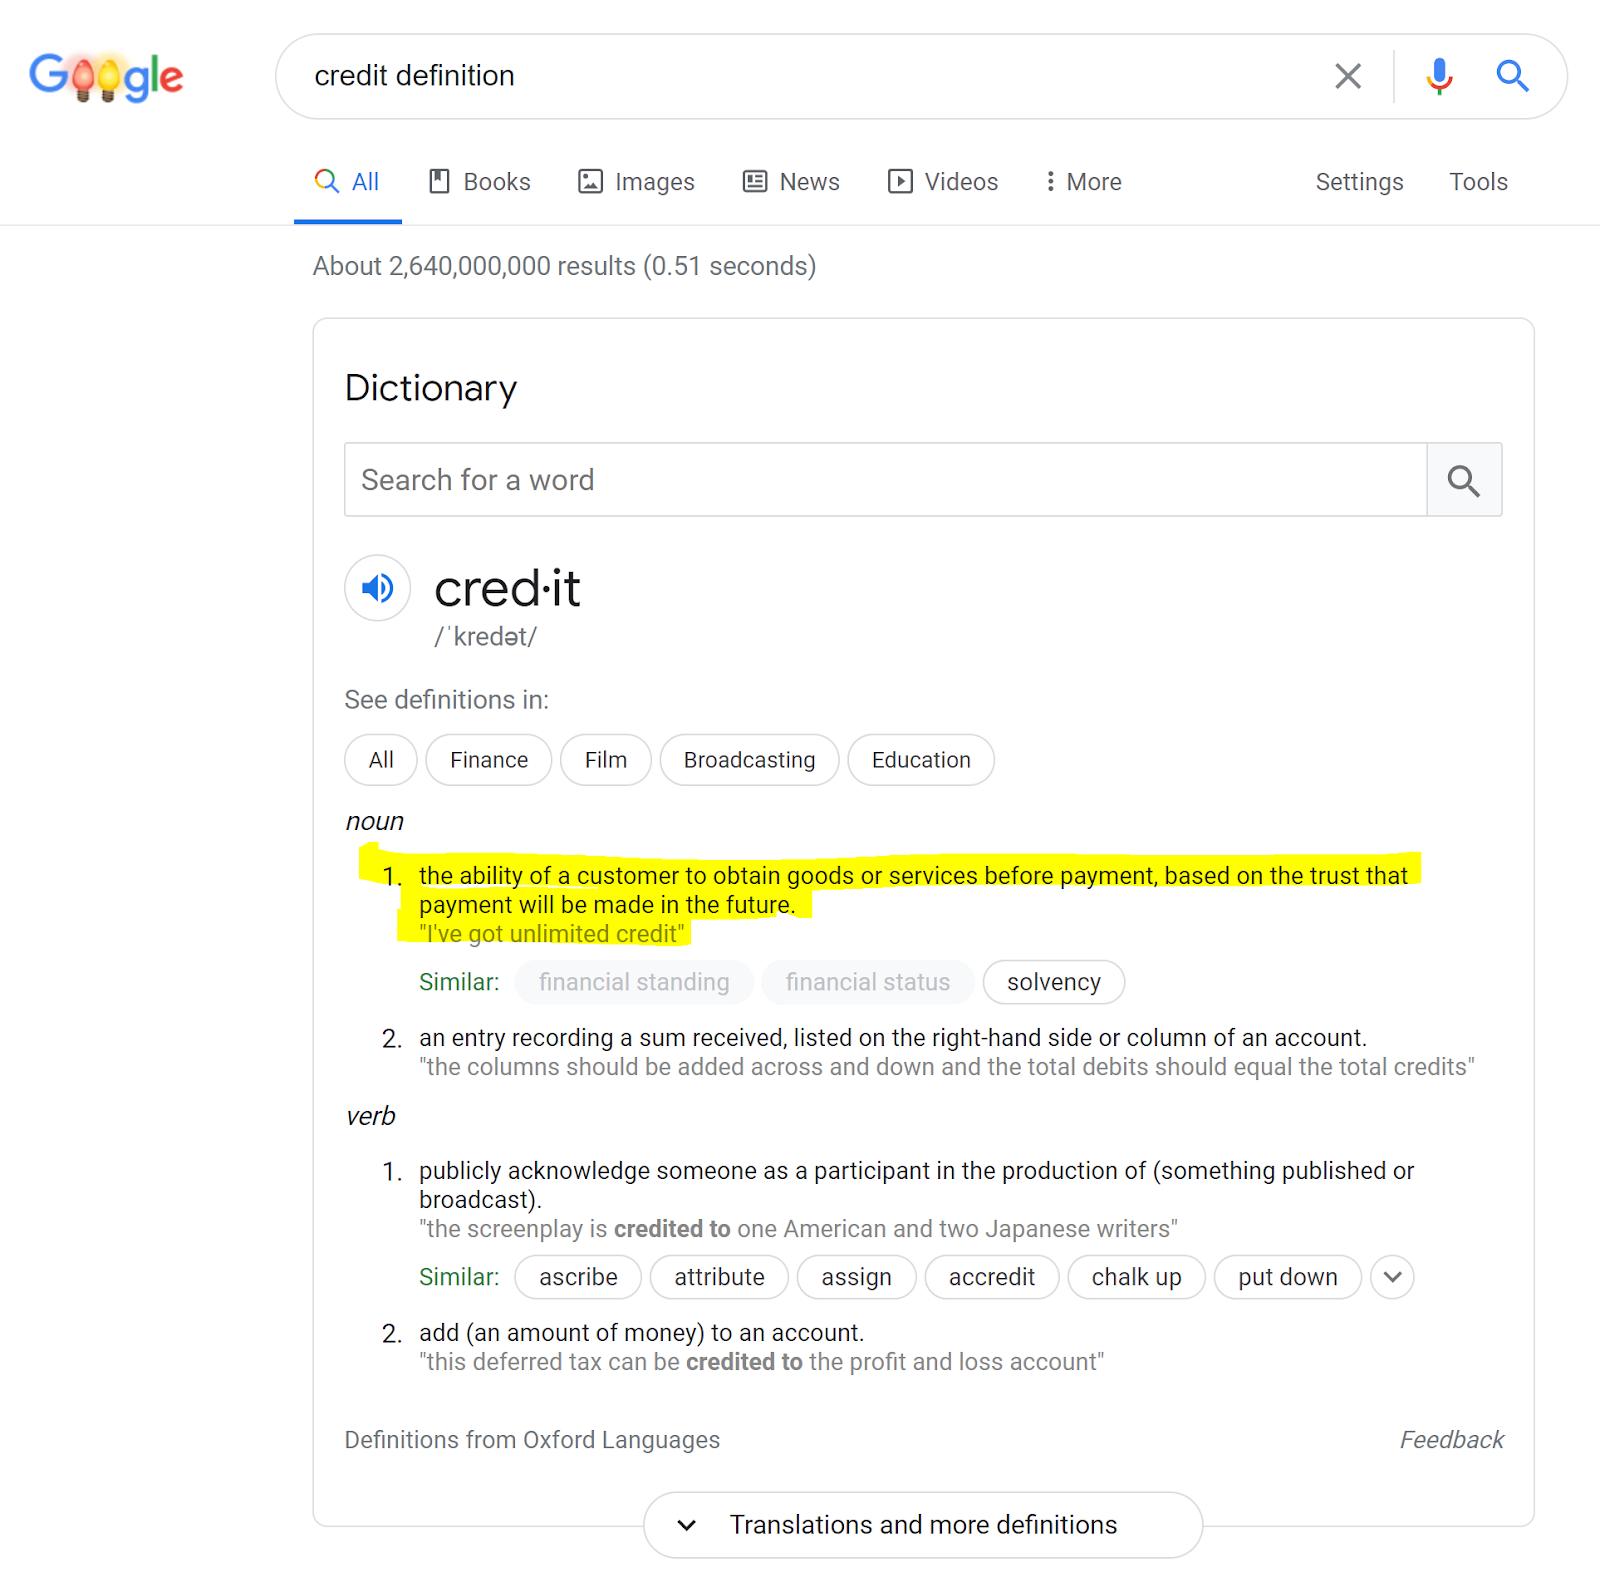 credit definition